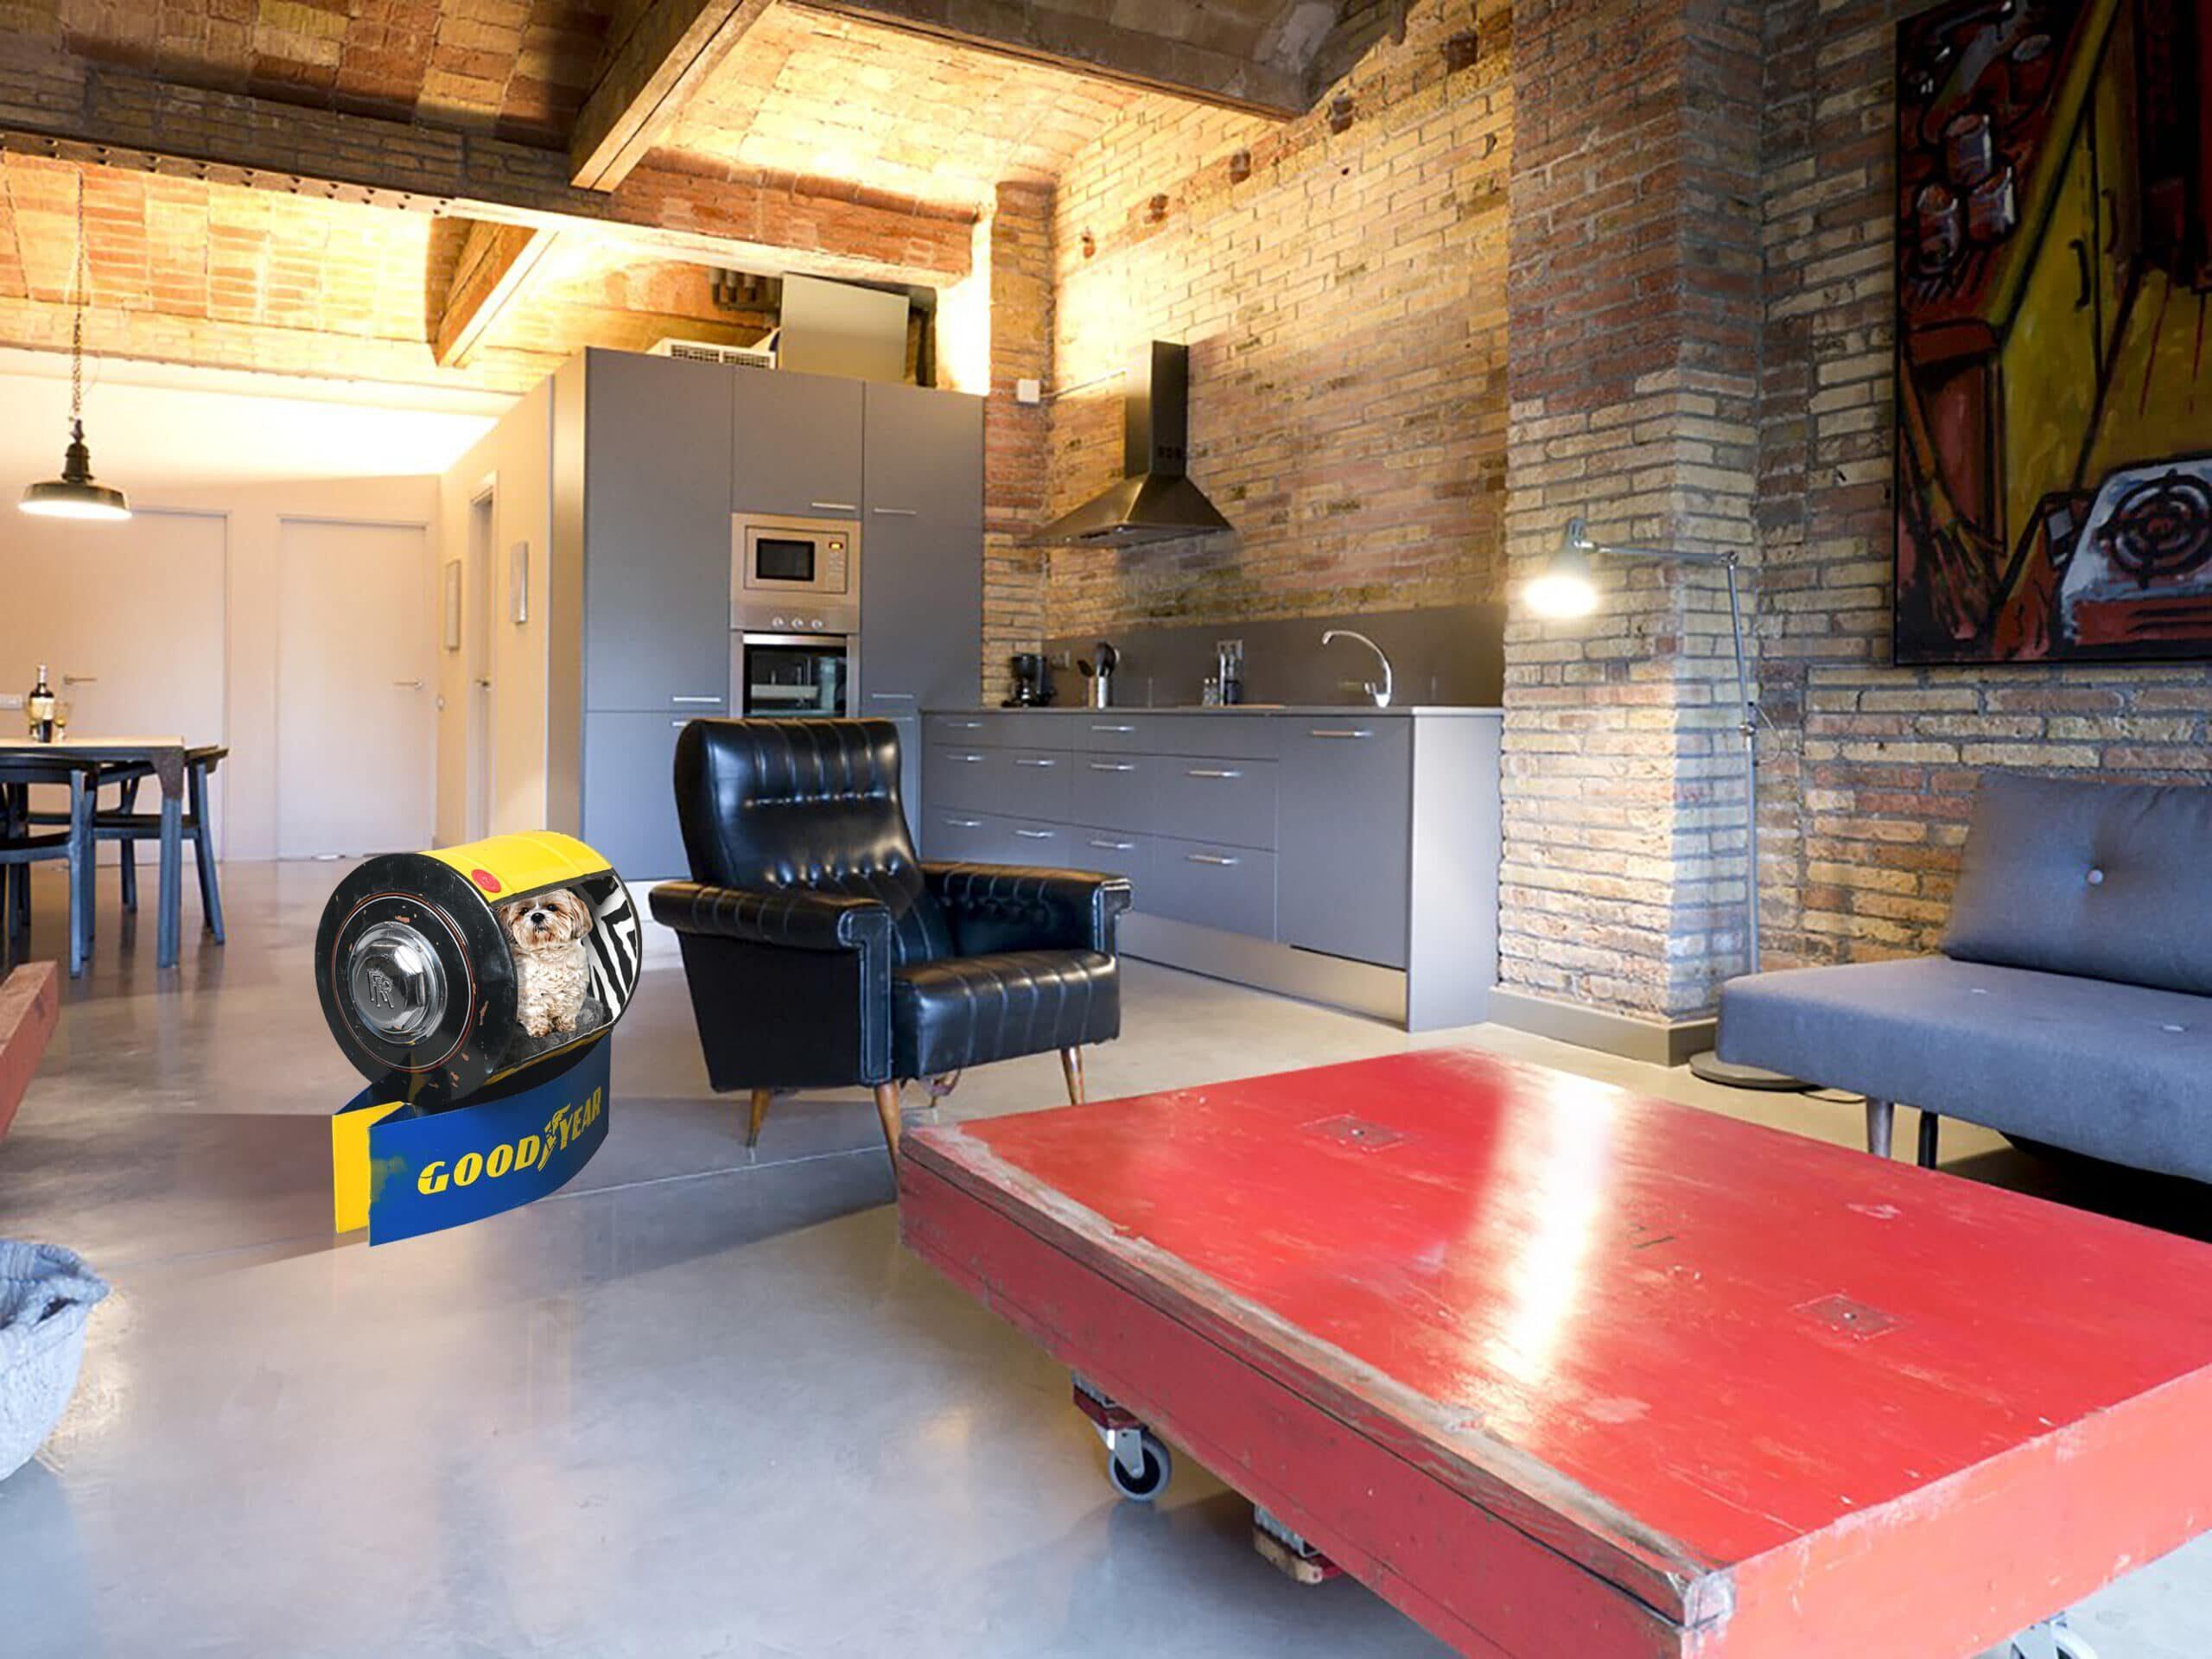 Decoration garage parts Rolls Royce / Goodyear Pets